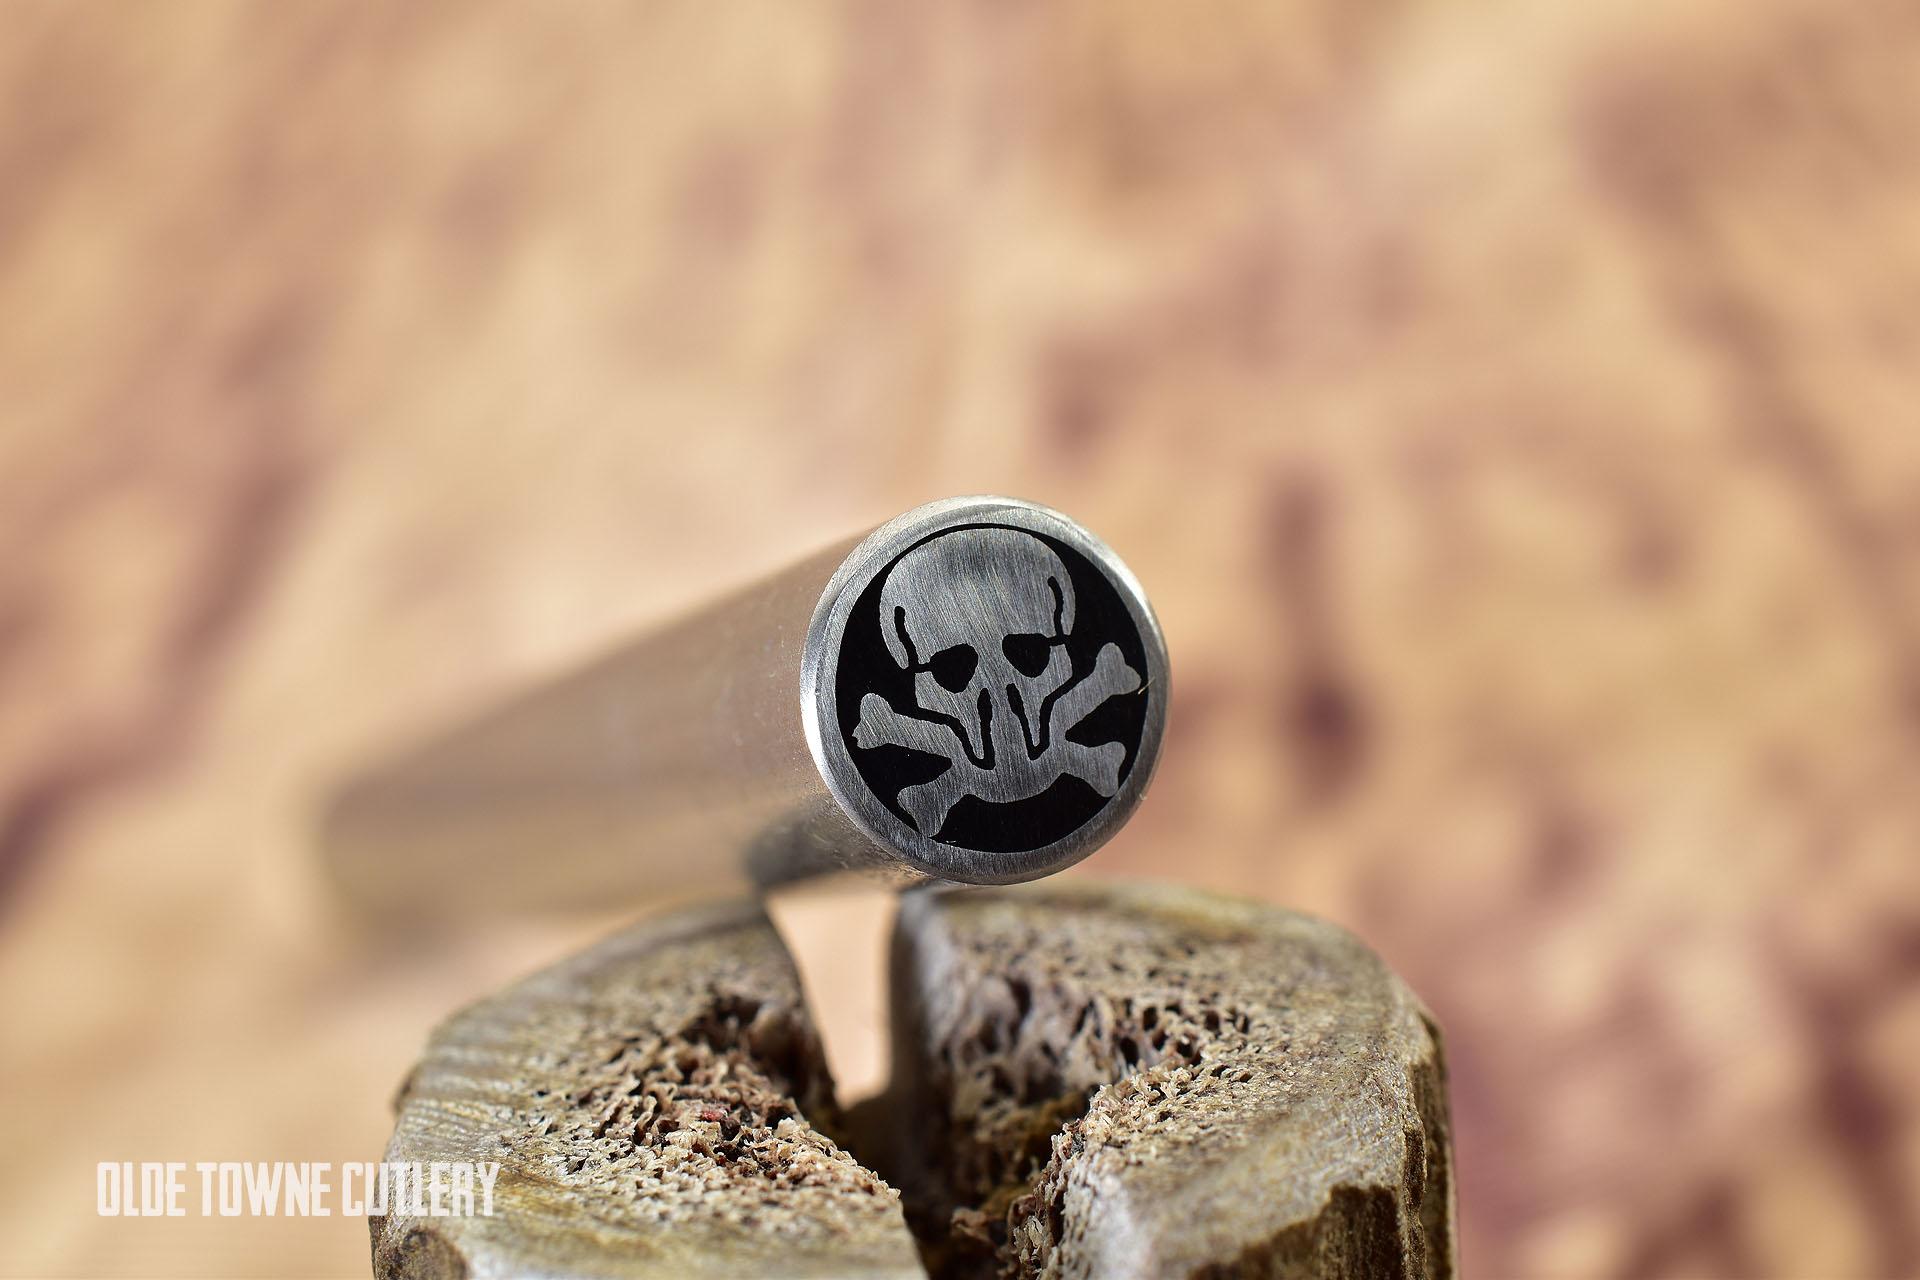 "Balatsky SKCR Mosaic Pin - Skull and Crossbones 1/4"" x 4"""